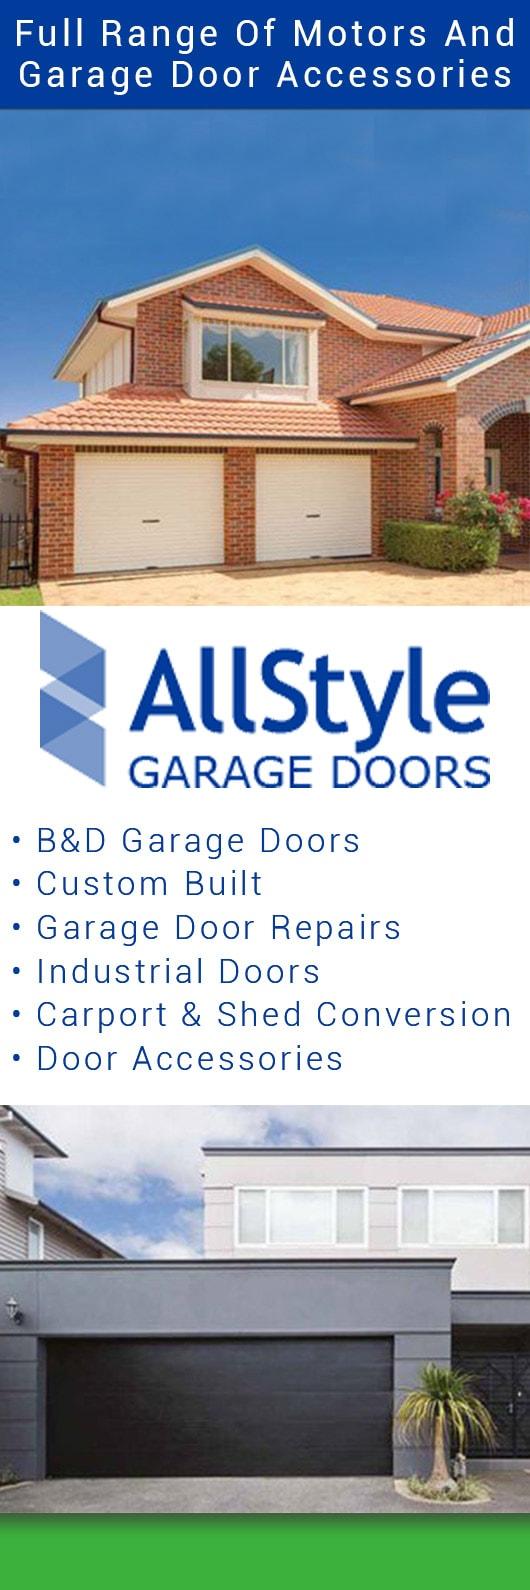 AllStyle Garage Doors - Promotion & AllStyle Garage Doors - Garage Doors u0026 Fittings - 1/ 715 South Rd ... pezcame.com